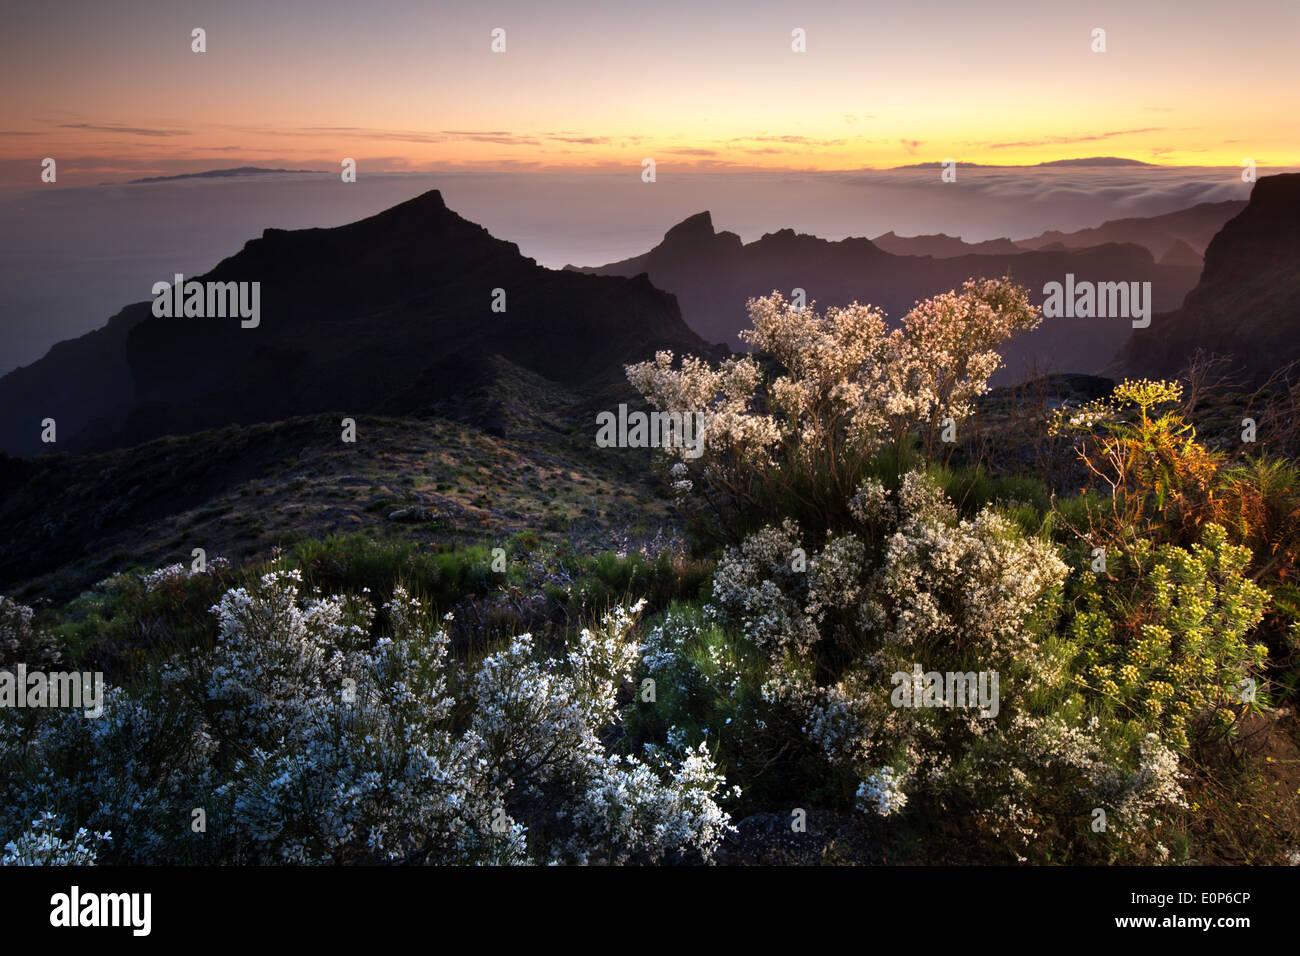 Mirador Degollada de Cherfe Blick über Teno-Gebirge mit Insel La Gomera und La Palma während Sonnenuntergang Teneriffa Kanaren Stockbild